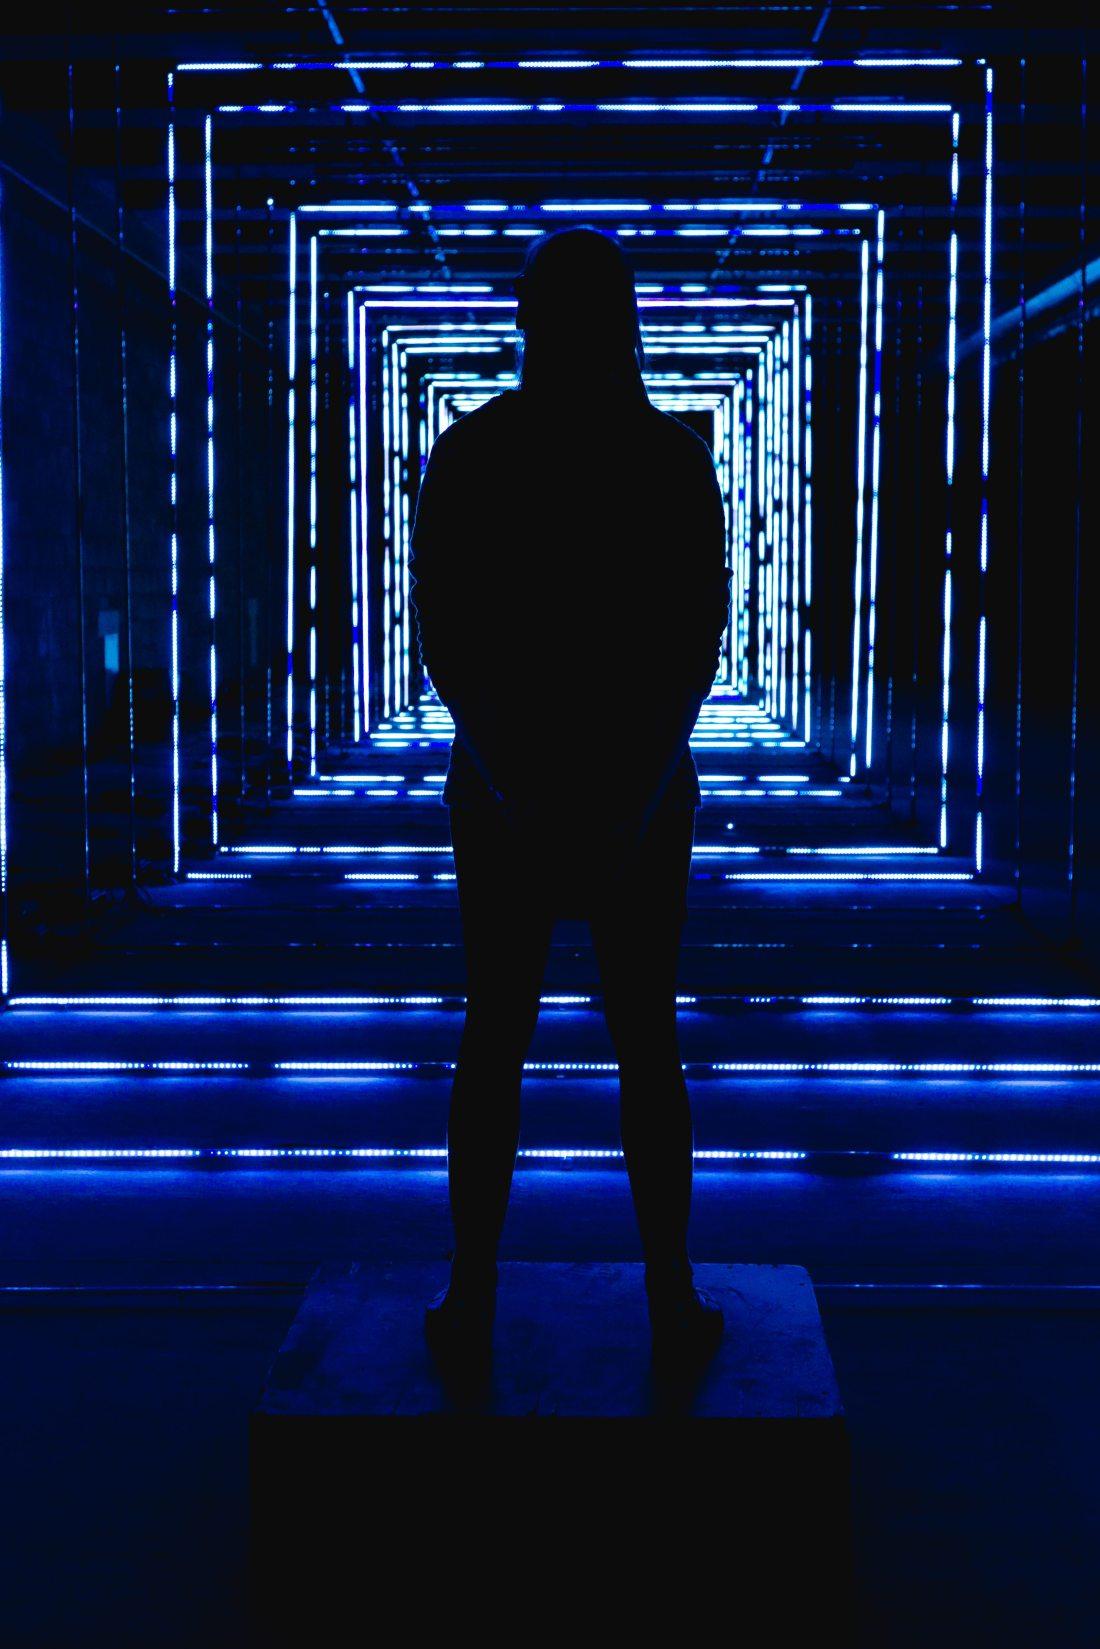 silhouette-of-person-1676889